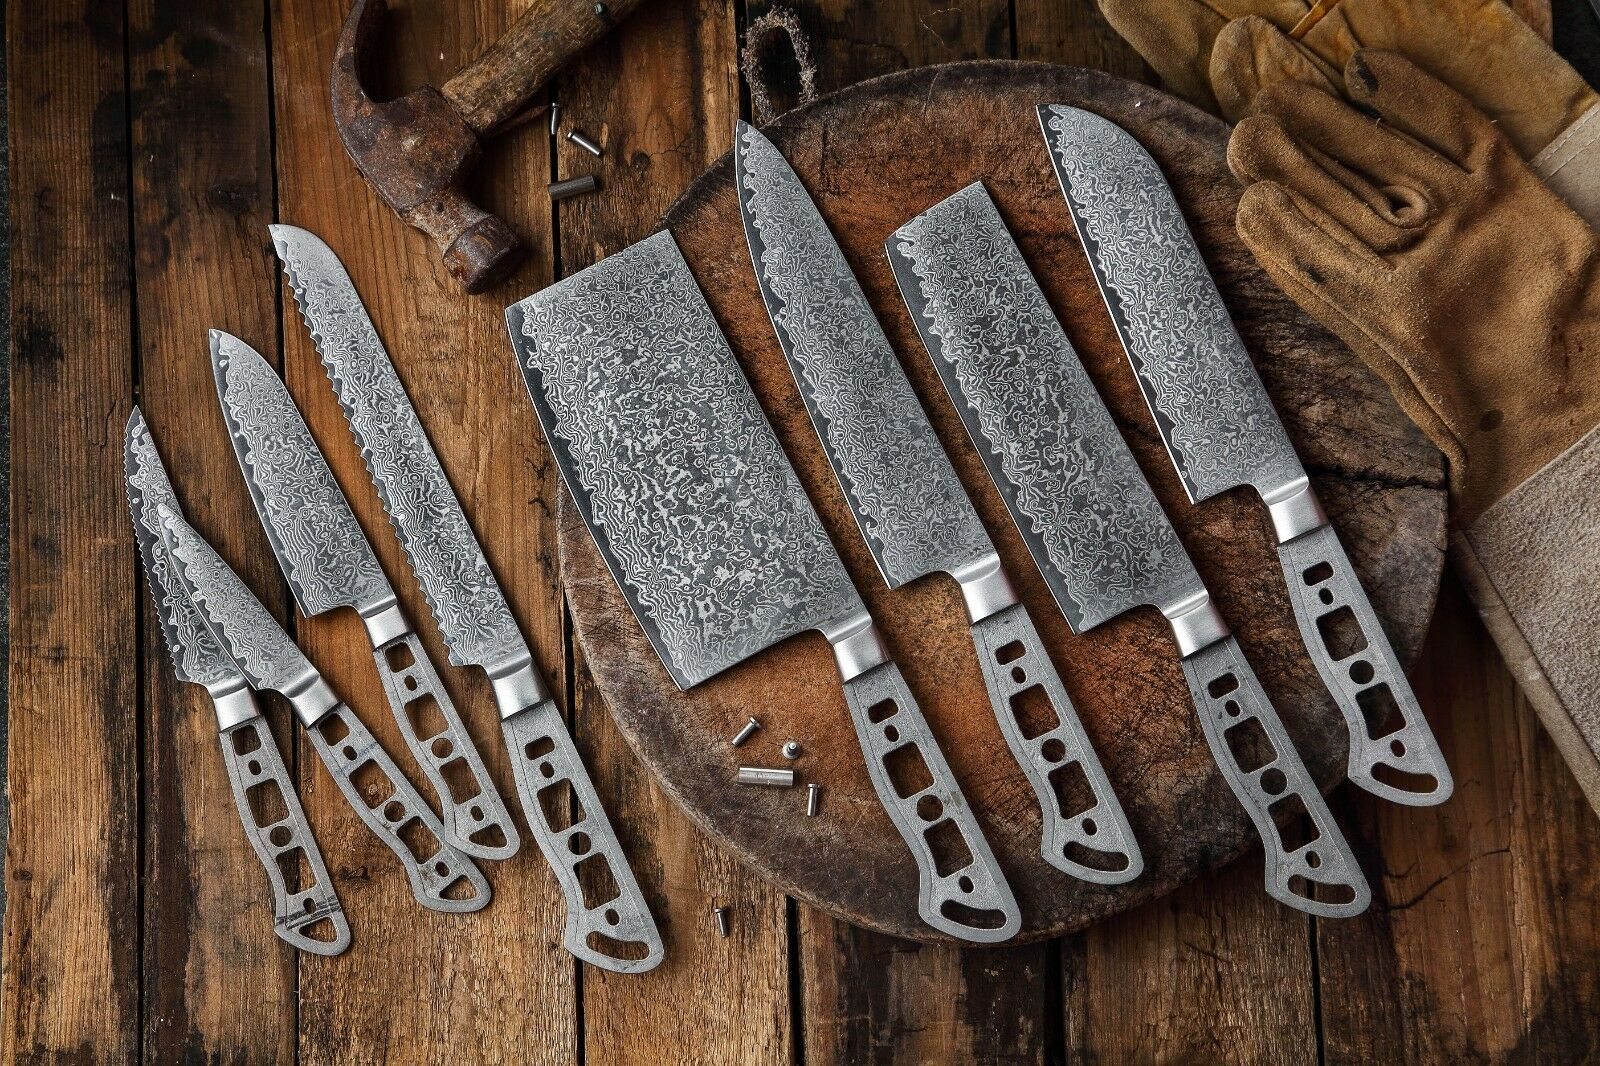 KATSURA Japanese AUS 10 Damascus Steel 67 Layer Chef's Knife blank set, 8pcs